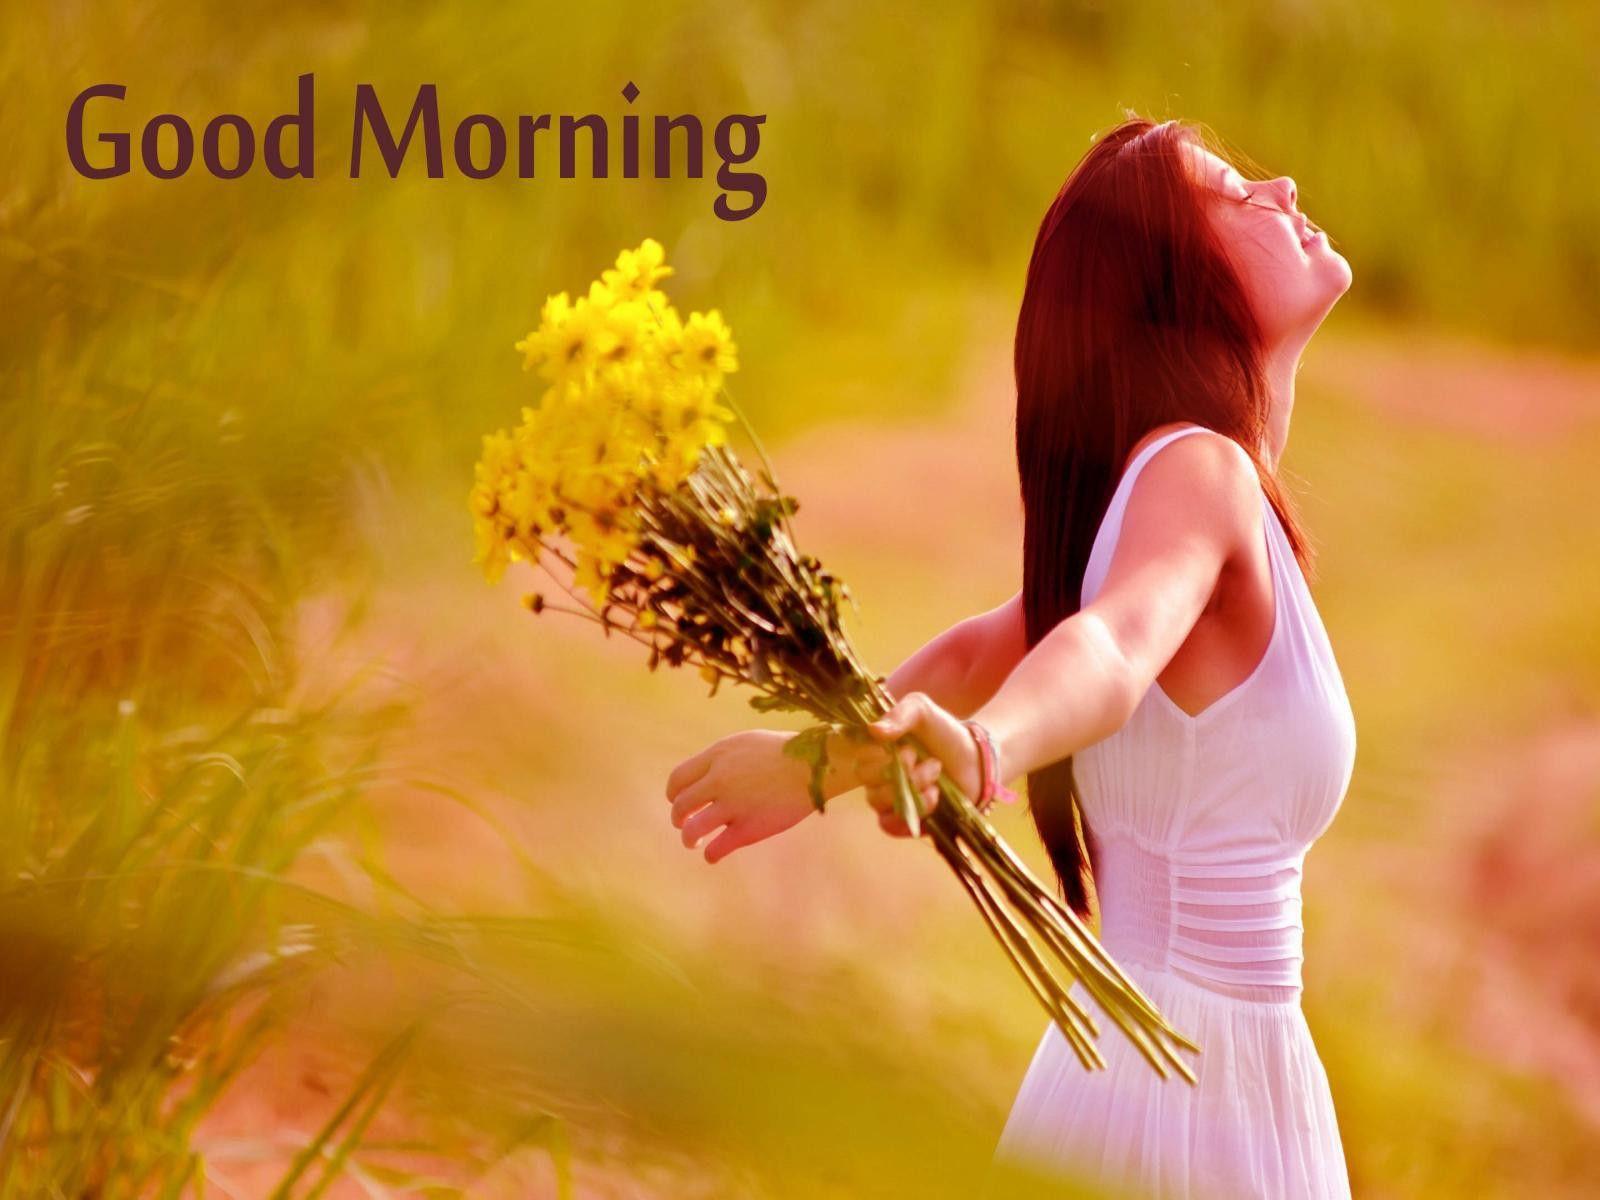 beautiful image morning Good girl